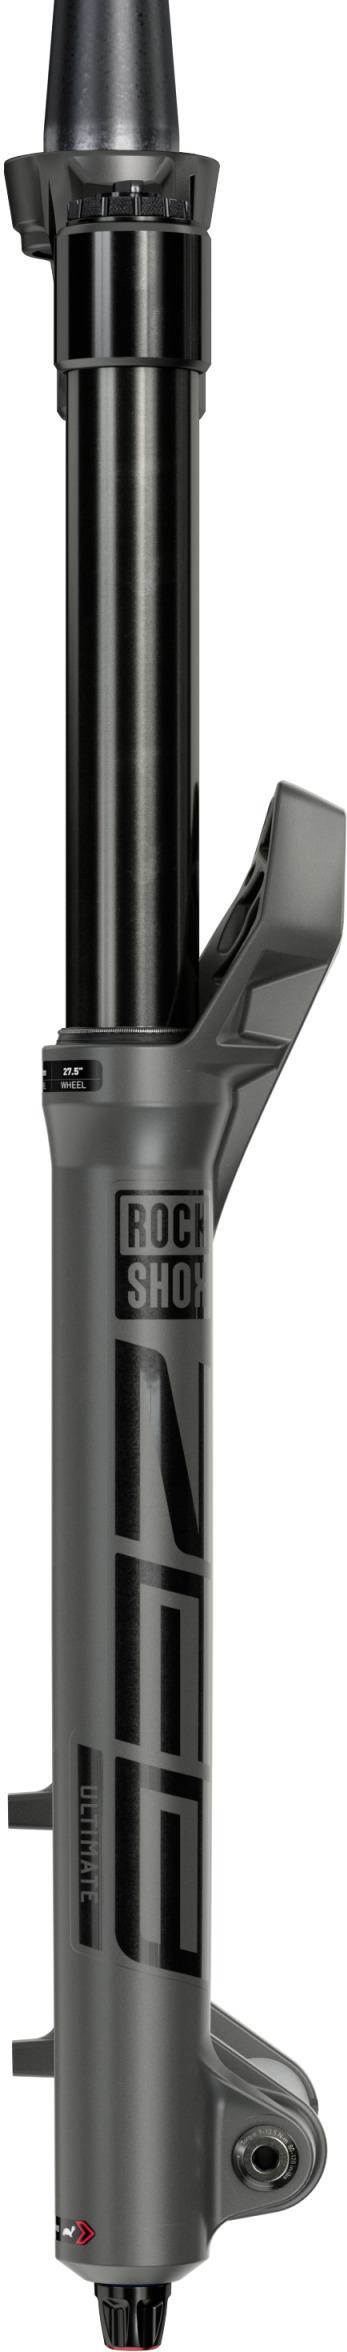 "Rock Shox Zeb Ultimate DebonAir Boost 29"" Federgabel grau | Modell 2021"